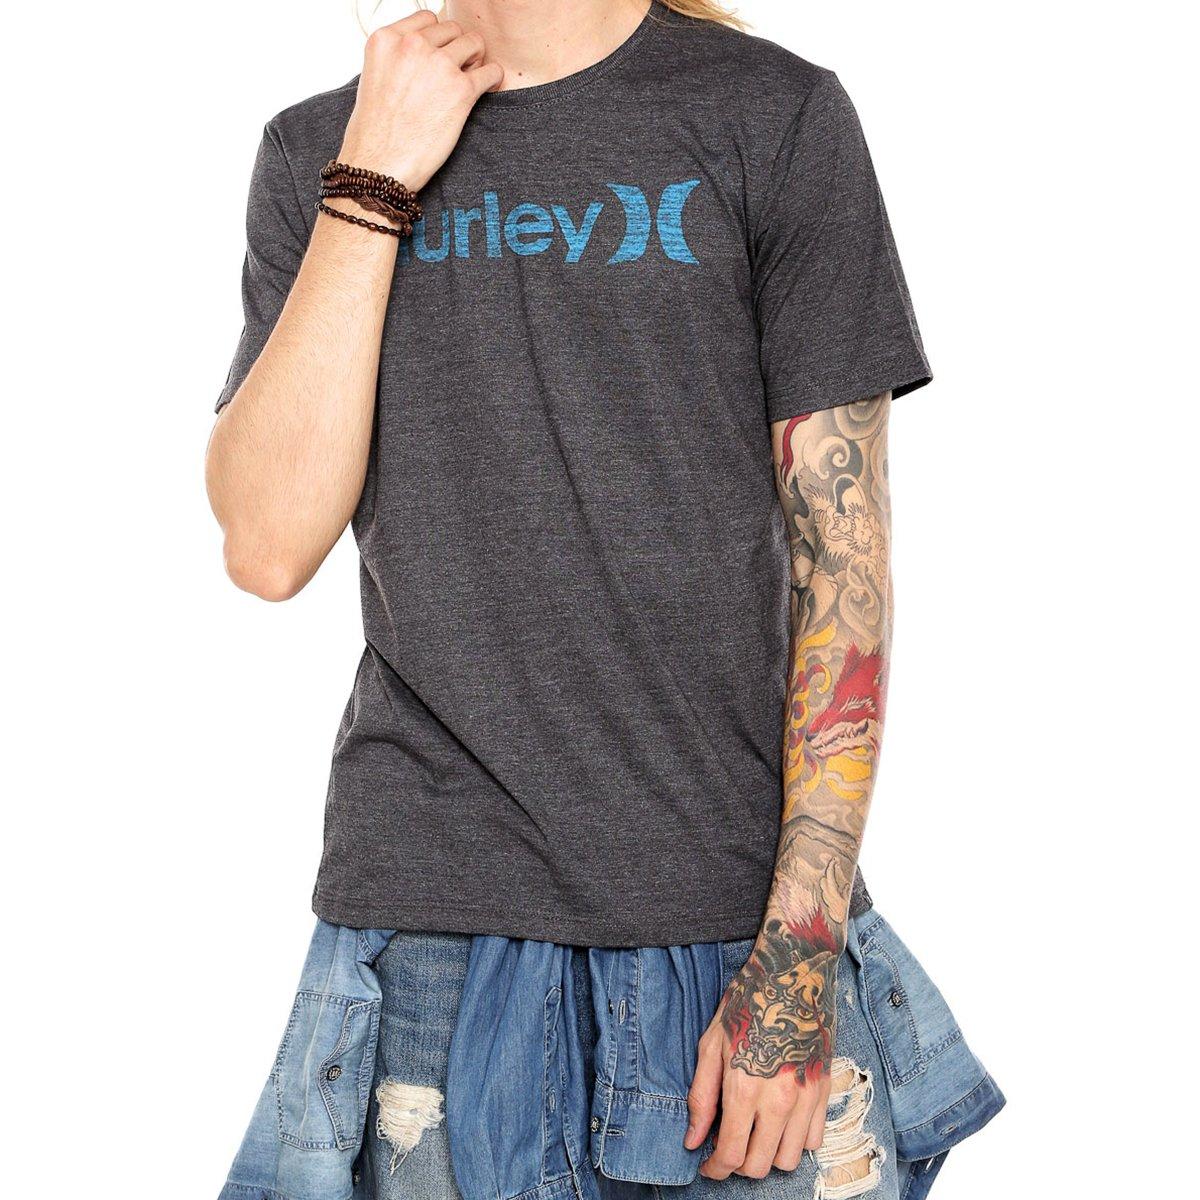 Camiseta Hurley Silk One E Only Masculina - Grafite